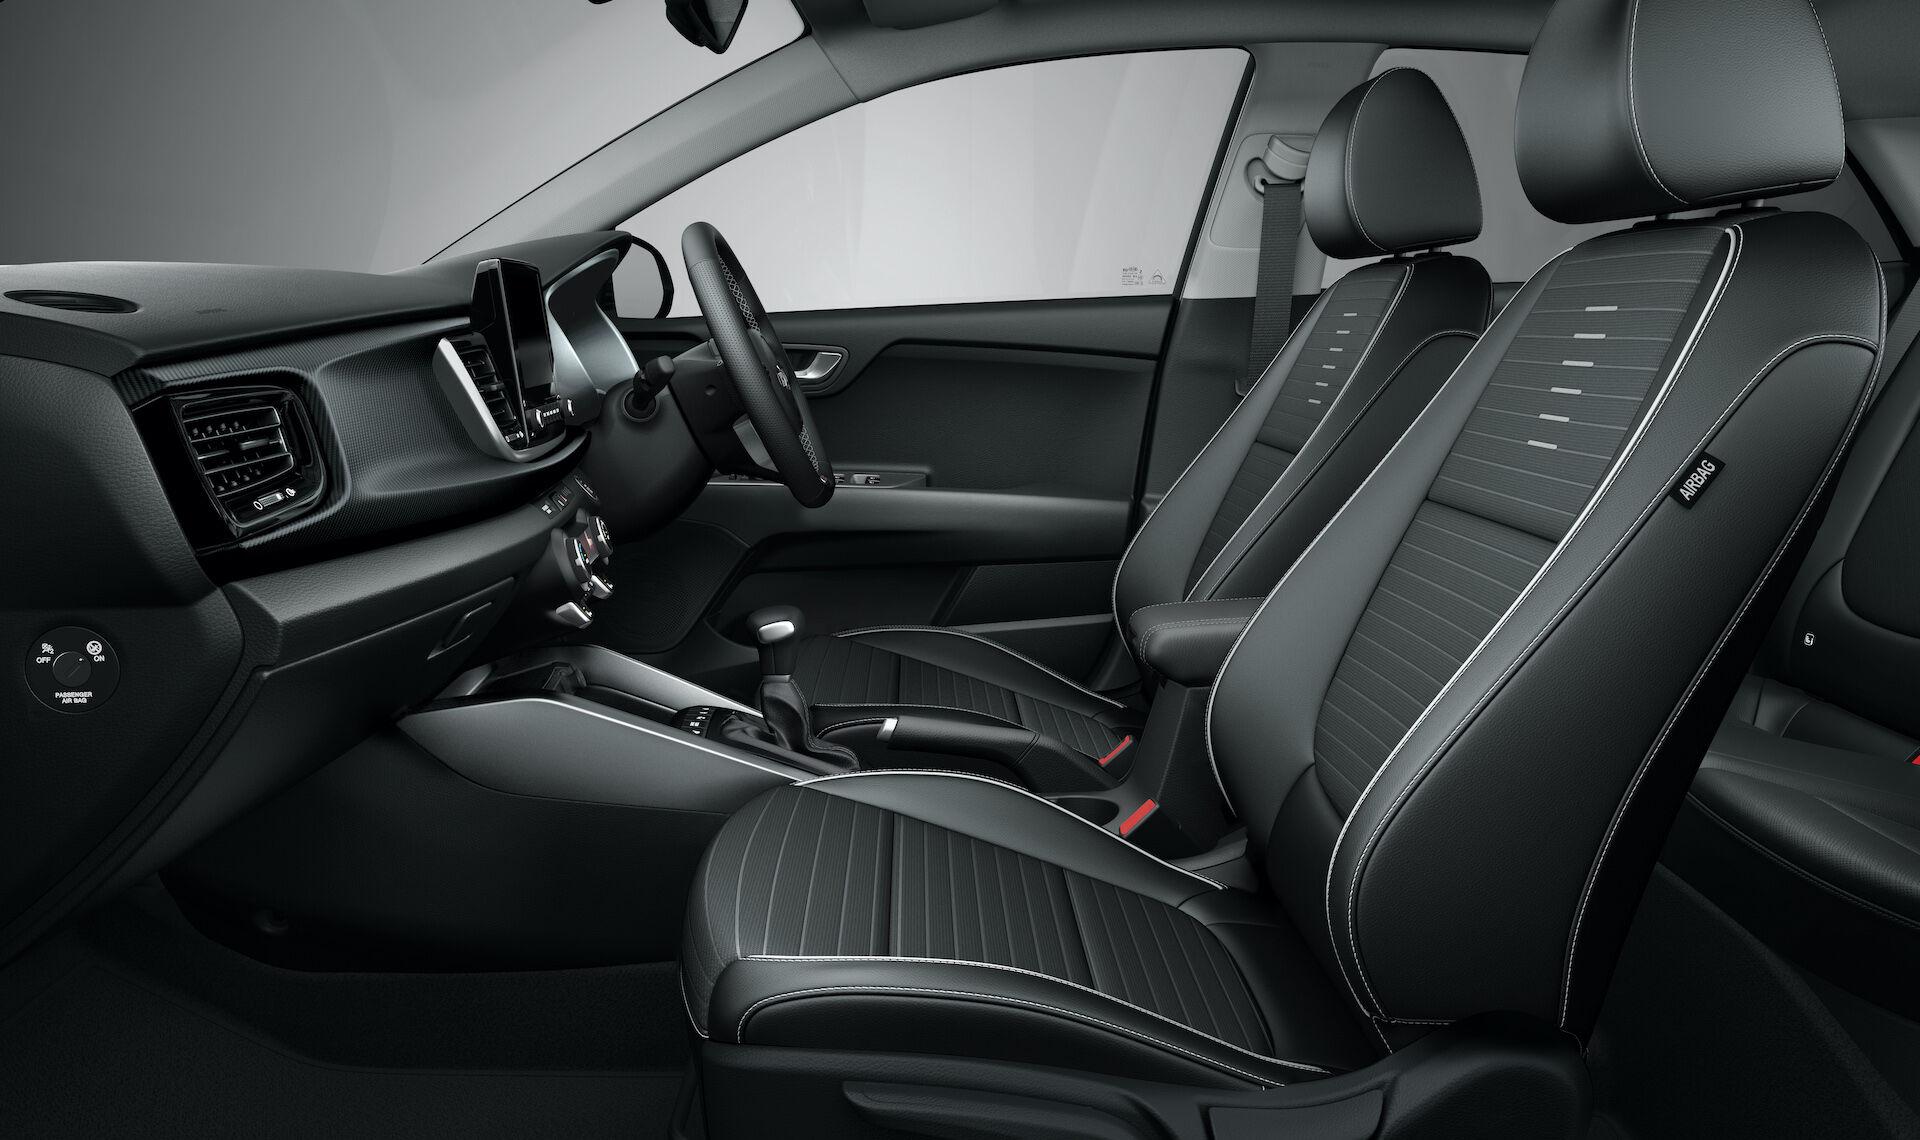 kia rio gt line my rhd interior ex optional grade saturn black artificial leather